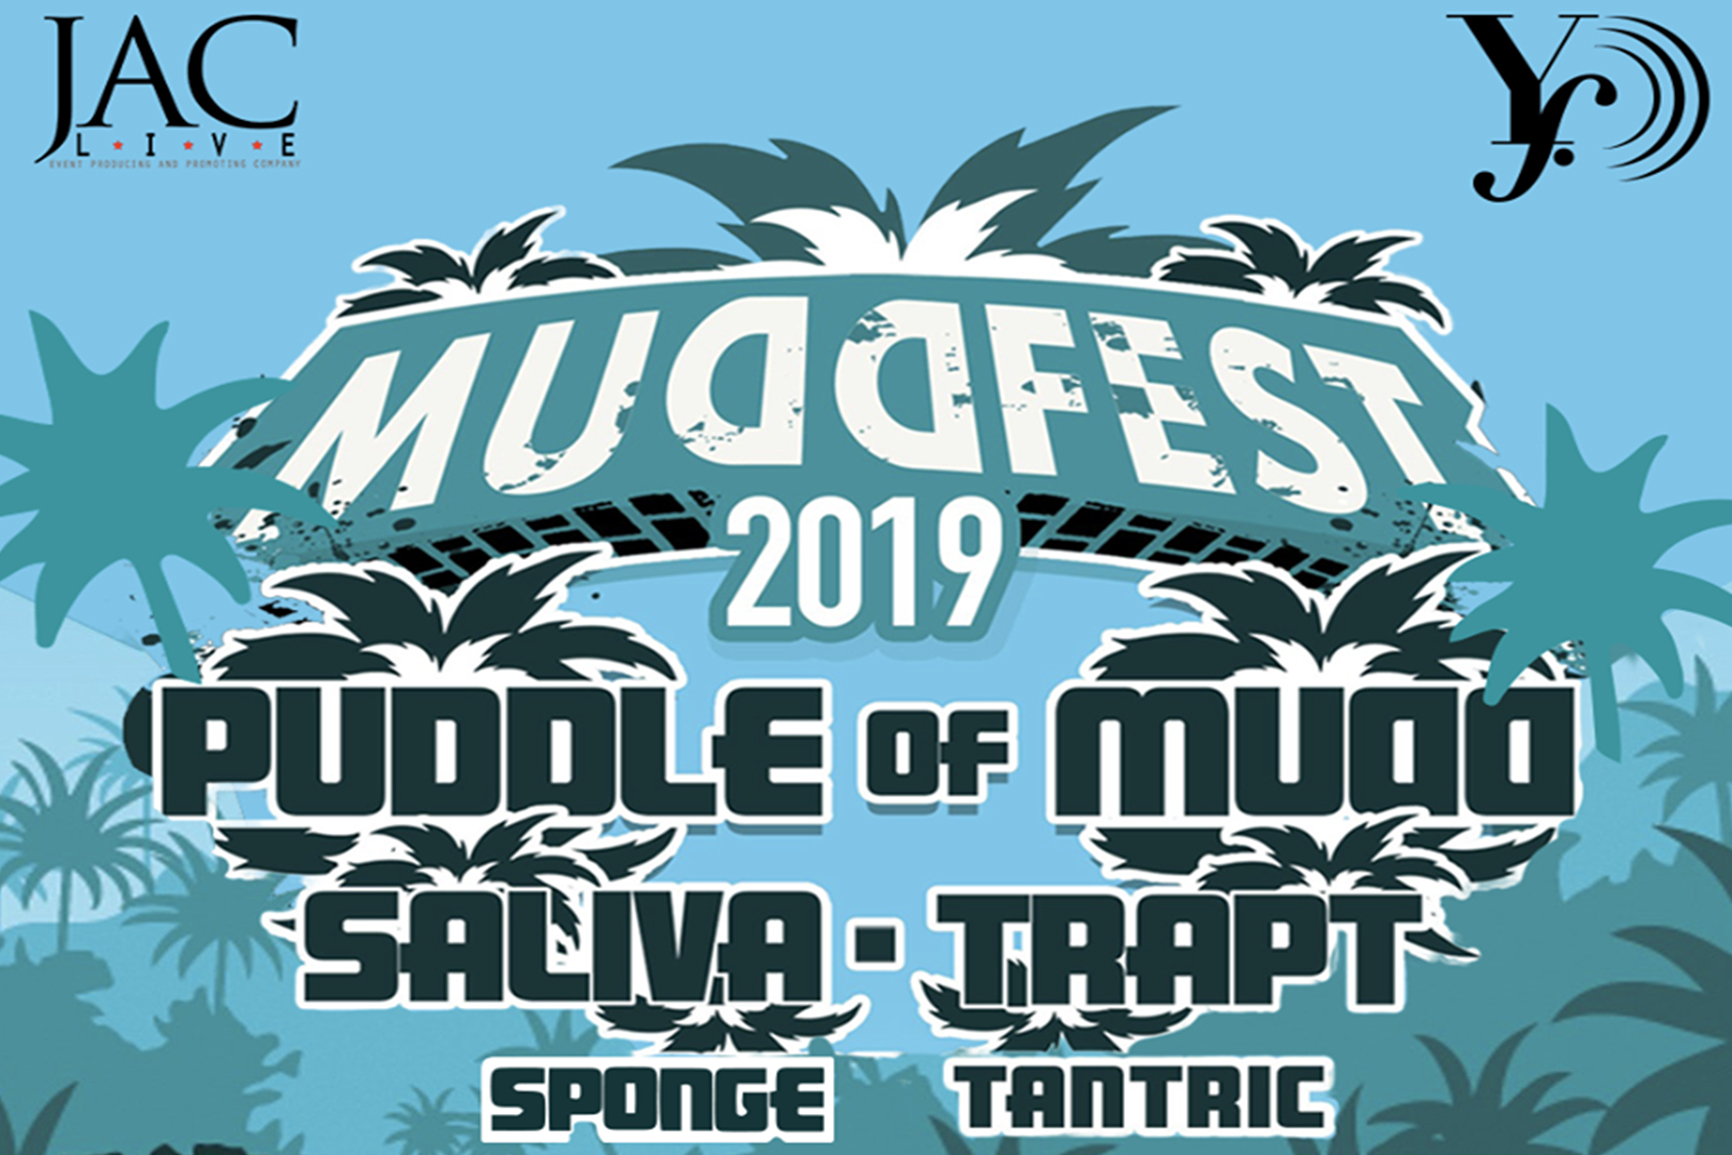 Mudd Fest